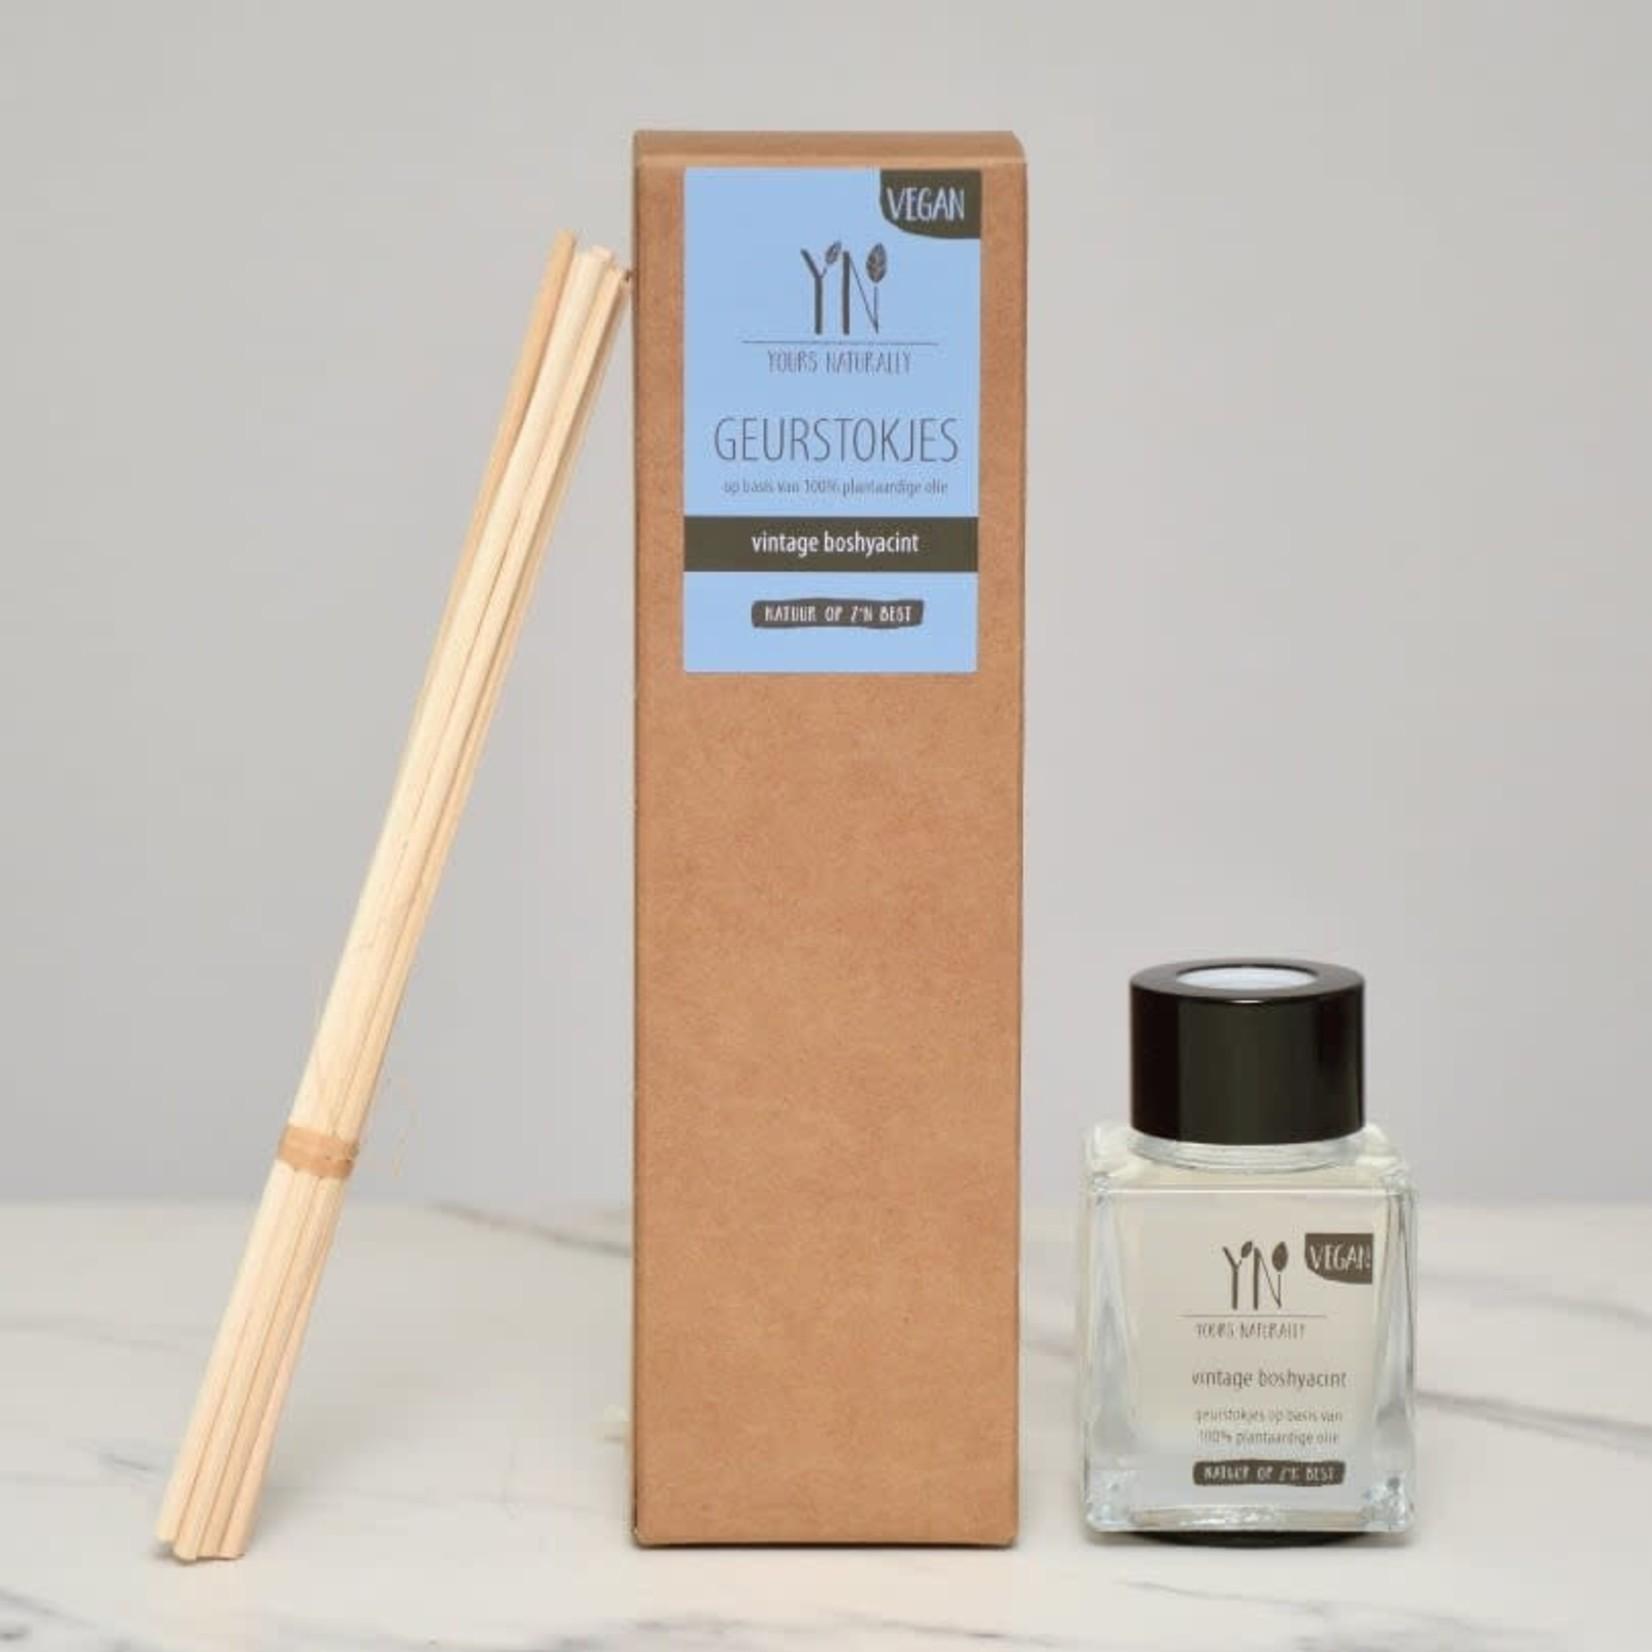 Yours Naturally • geurstokjes vintage boshyacint